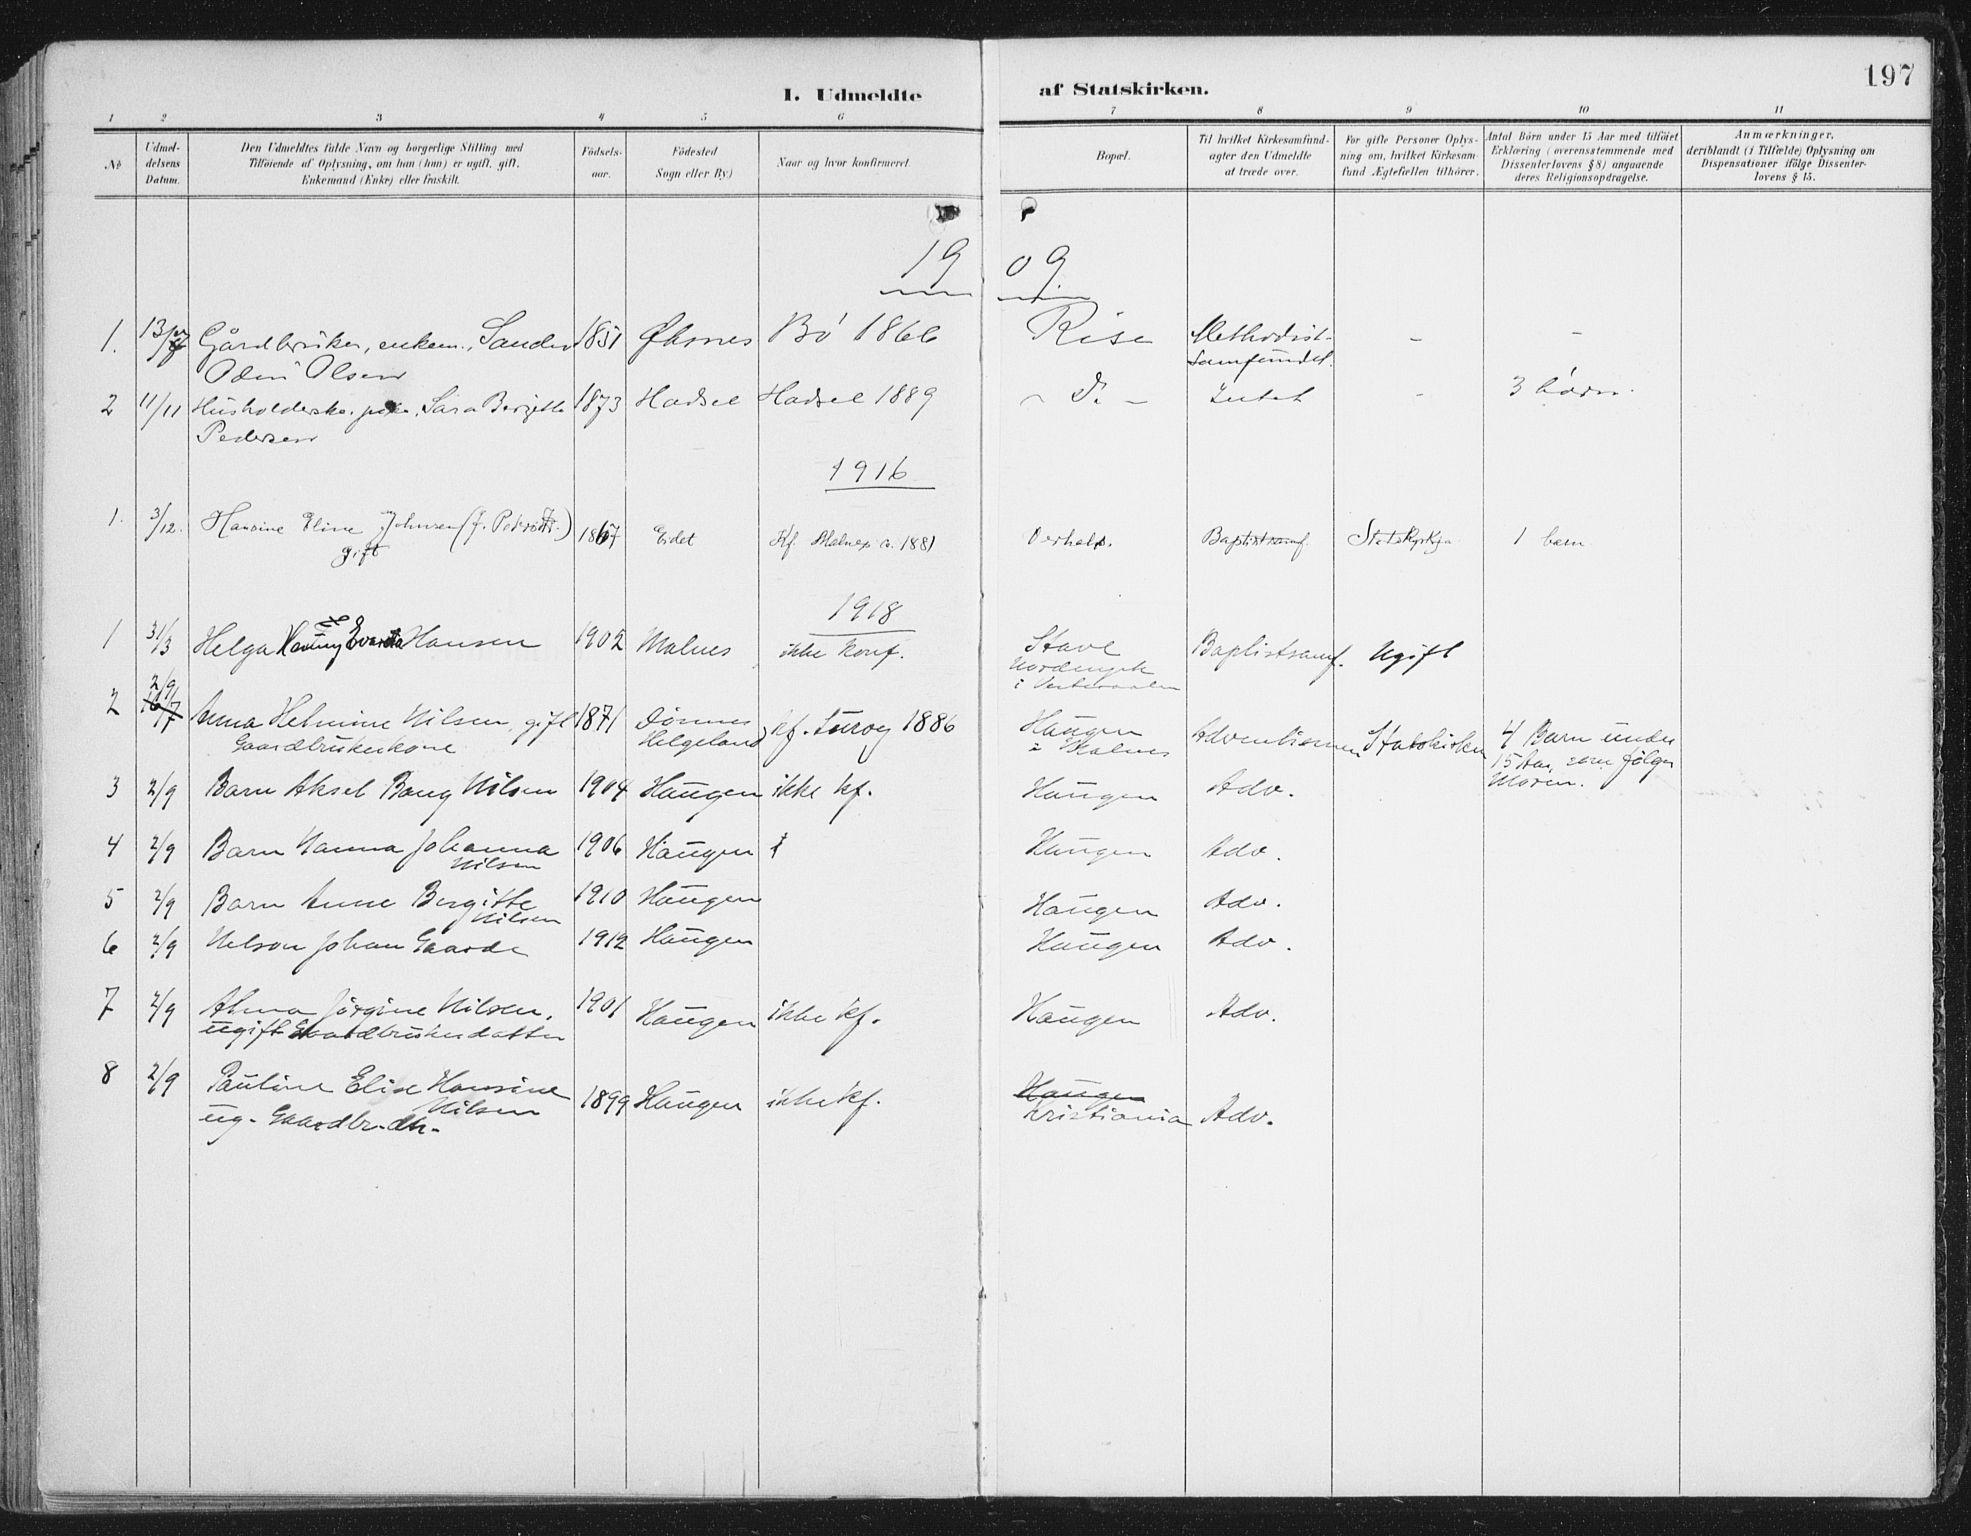 SAT, Ministerialprotokoller, klokkerbøker og fødselsregistre - Nordland, 892/L1321: Ministerialbok nr. 892A02, 1902-1918, s. 197